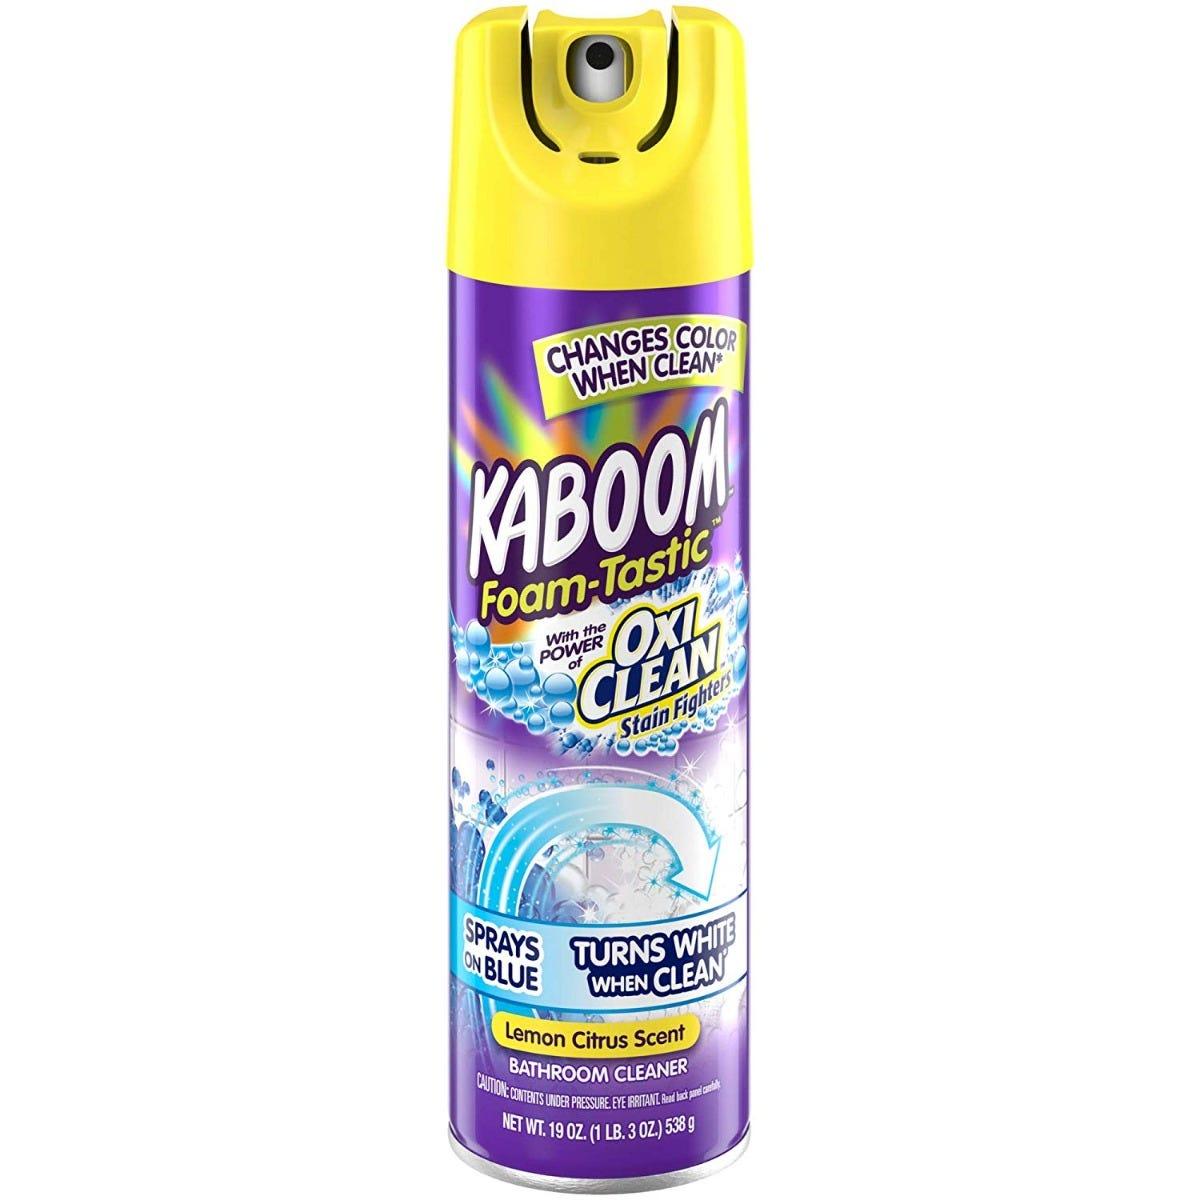 Kaboom Foam-Tastic Limpiador de baño